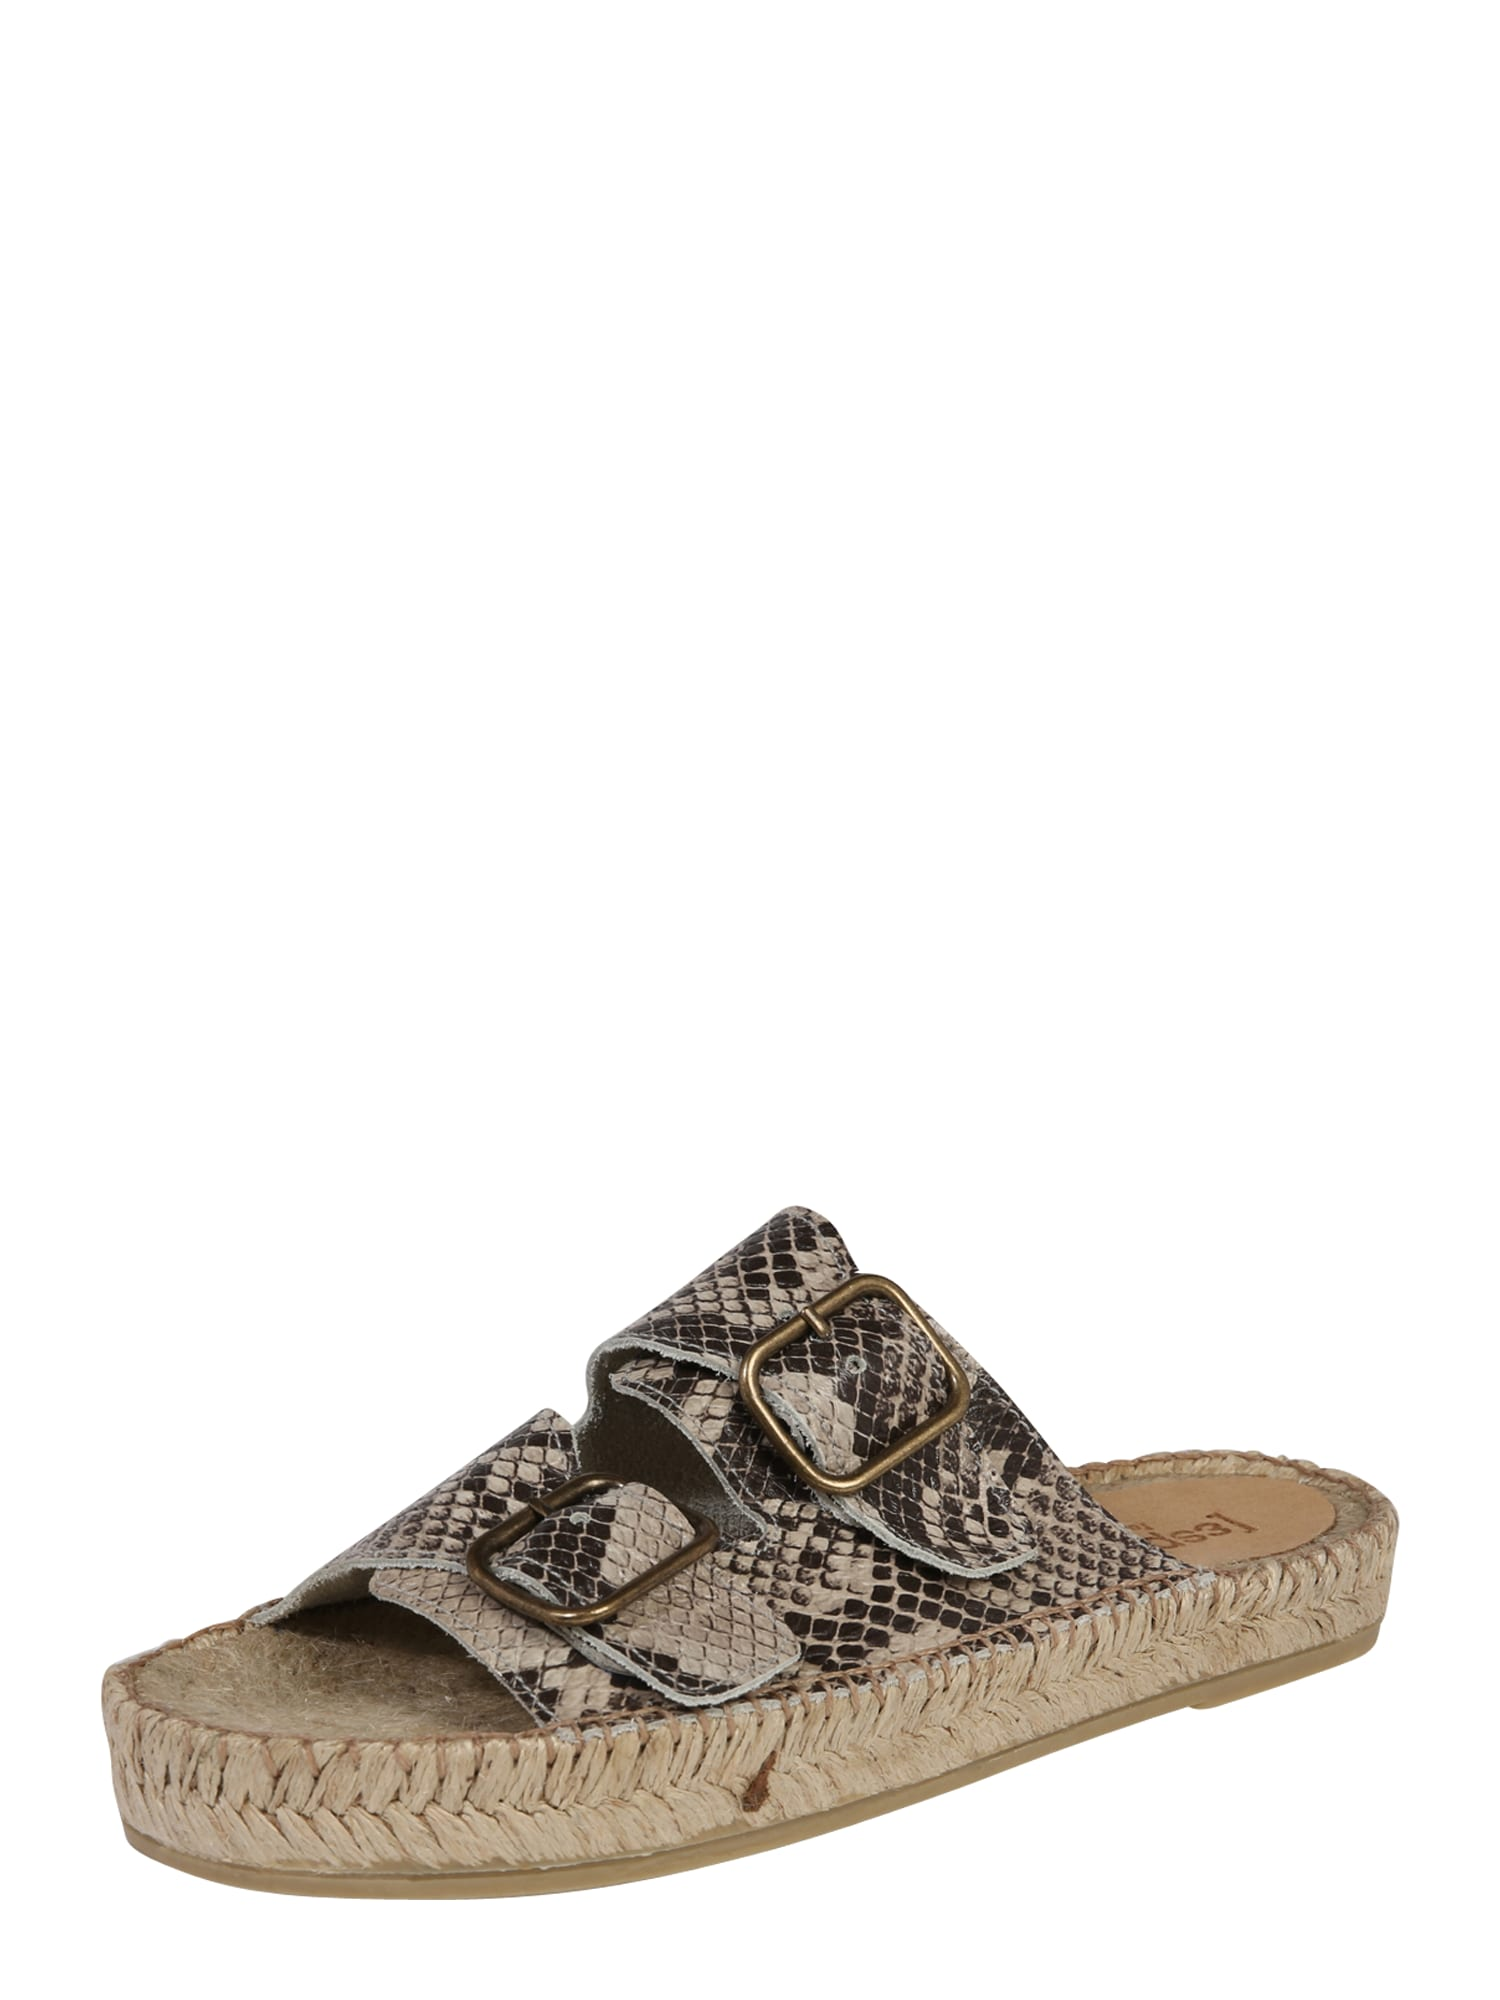 Pantofle Claquette Print béžová Espadrij L´originale